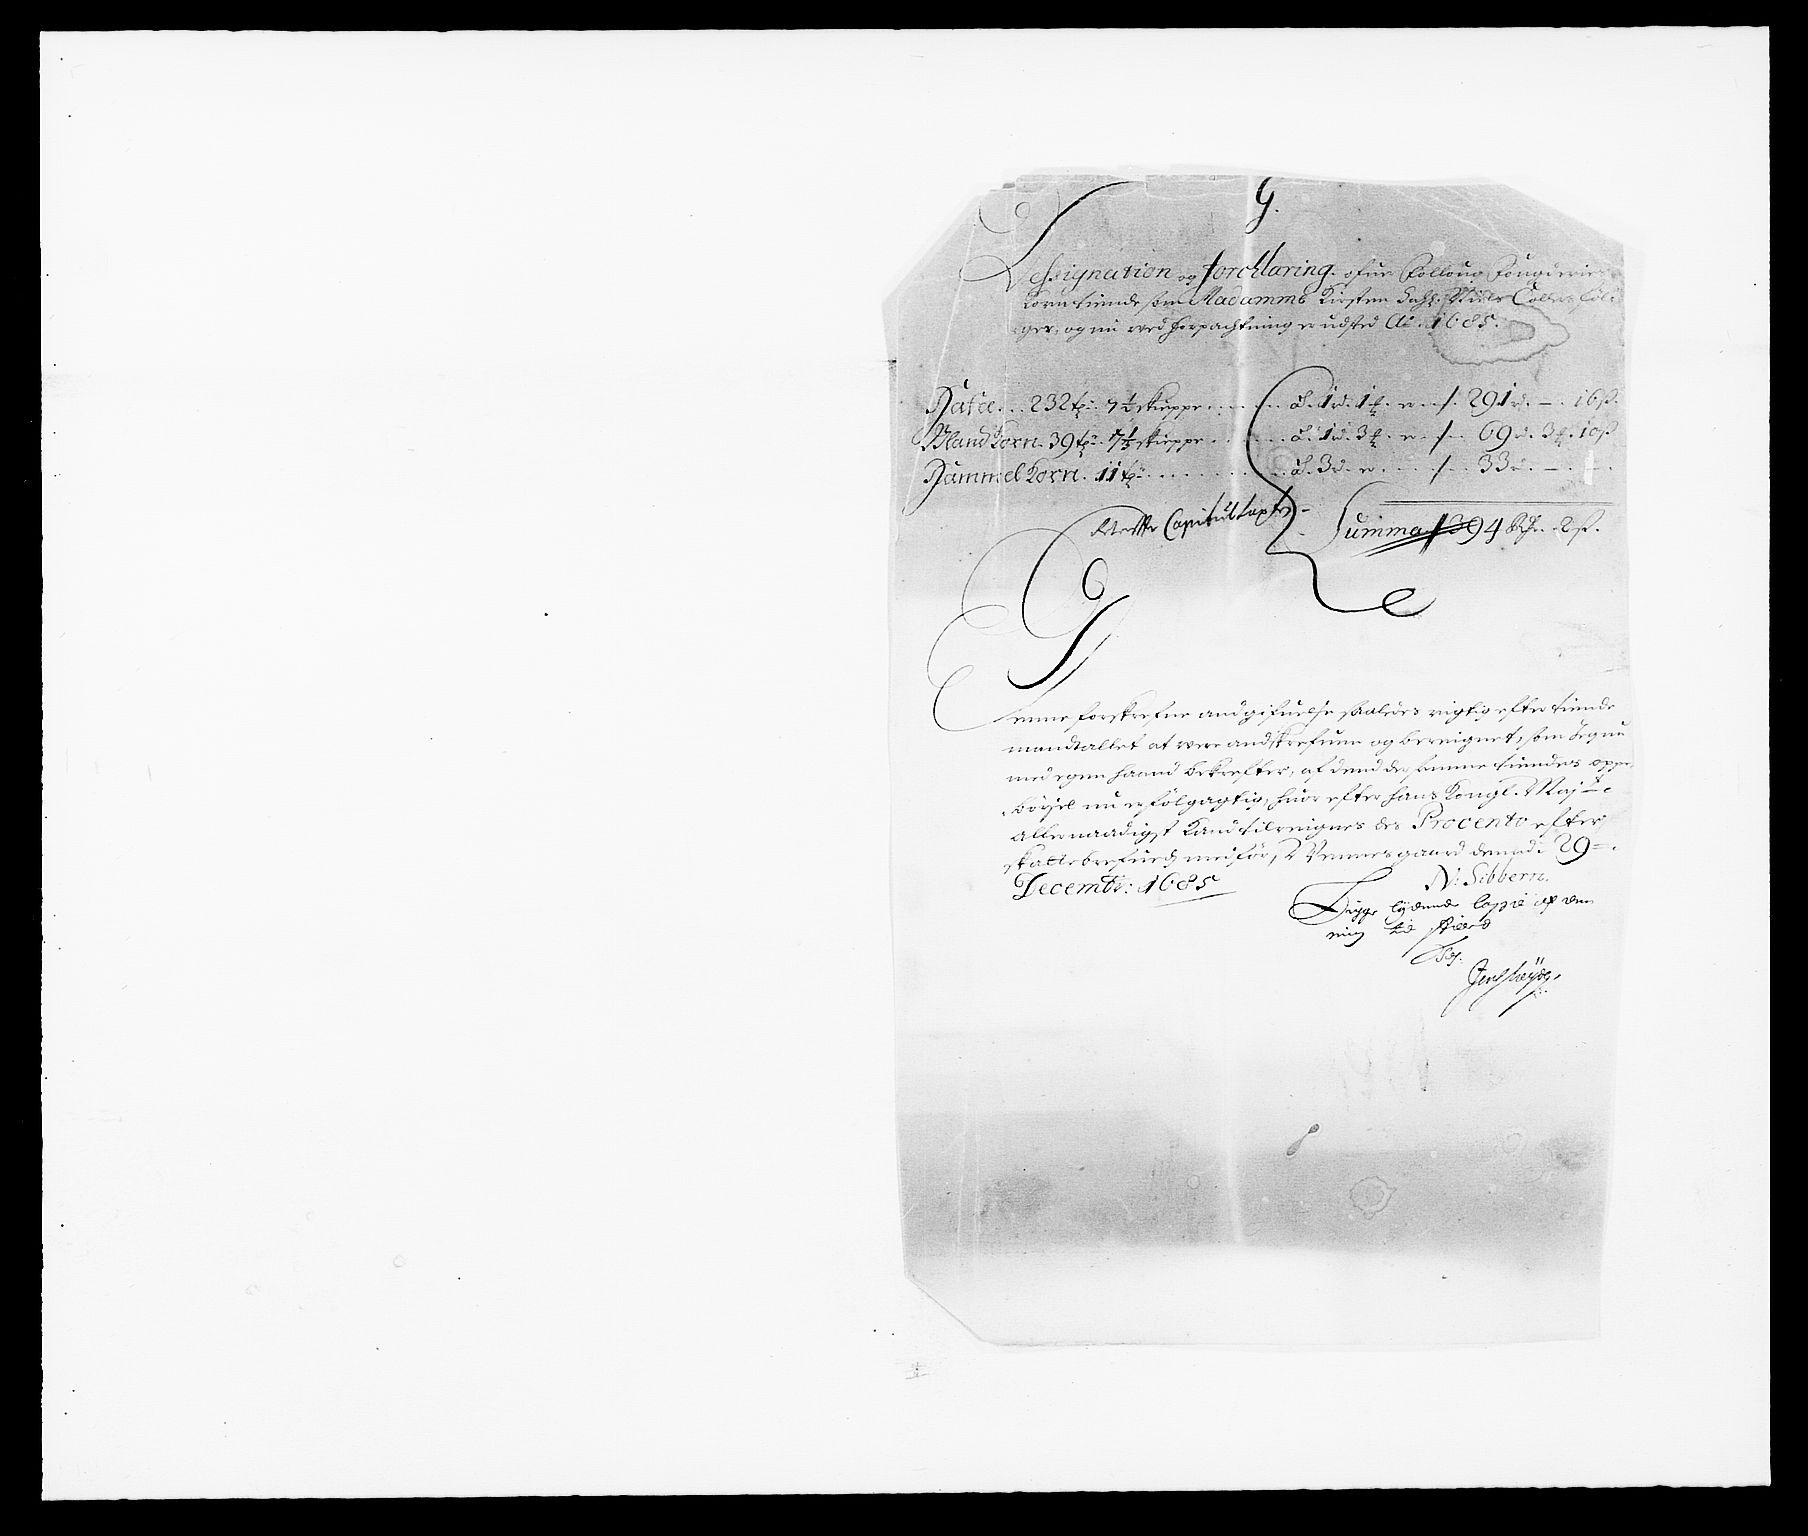 RA, Rentekammeret inntil 1814, Reviderte regnskaper, Fogderegnskap, R09/L0433: Fogderegnskap Follo, 1685-1686, s. 186